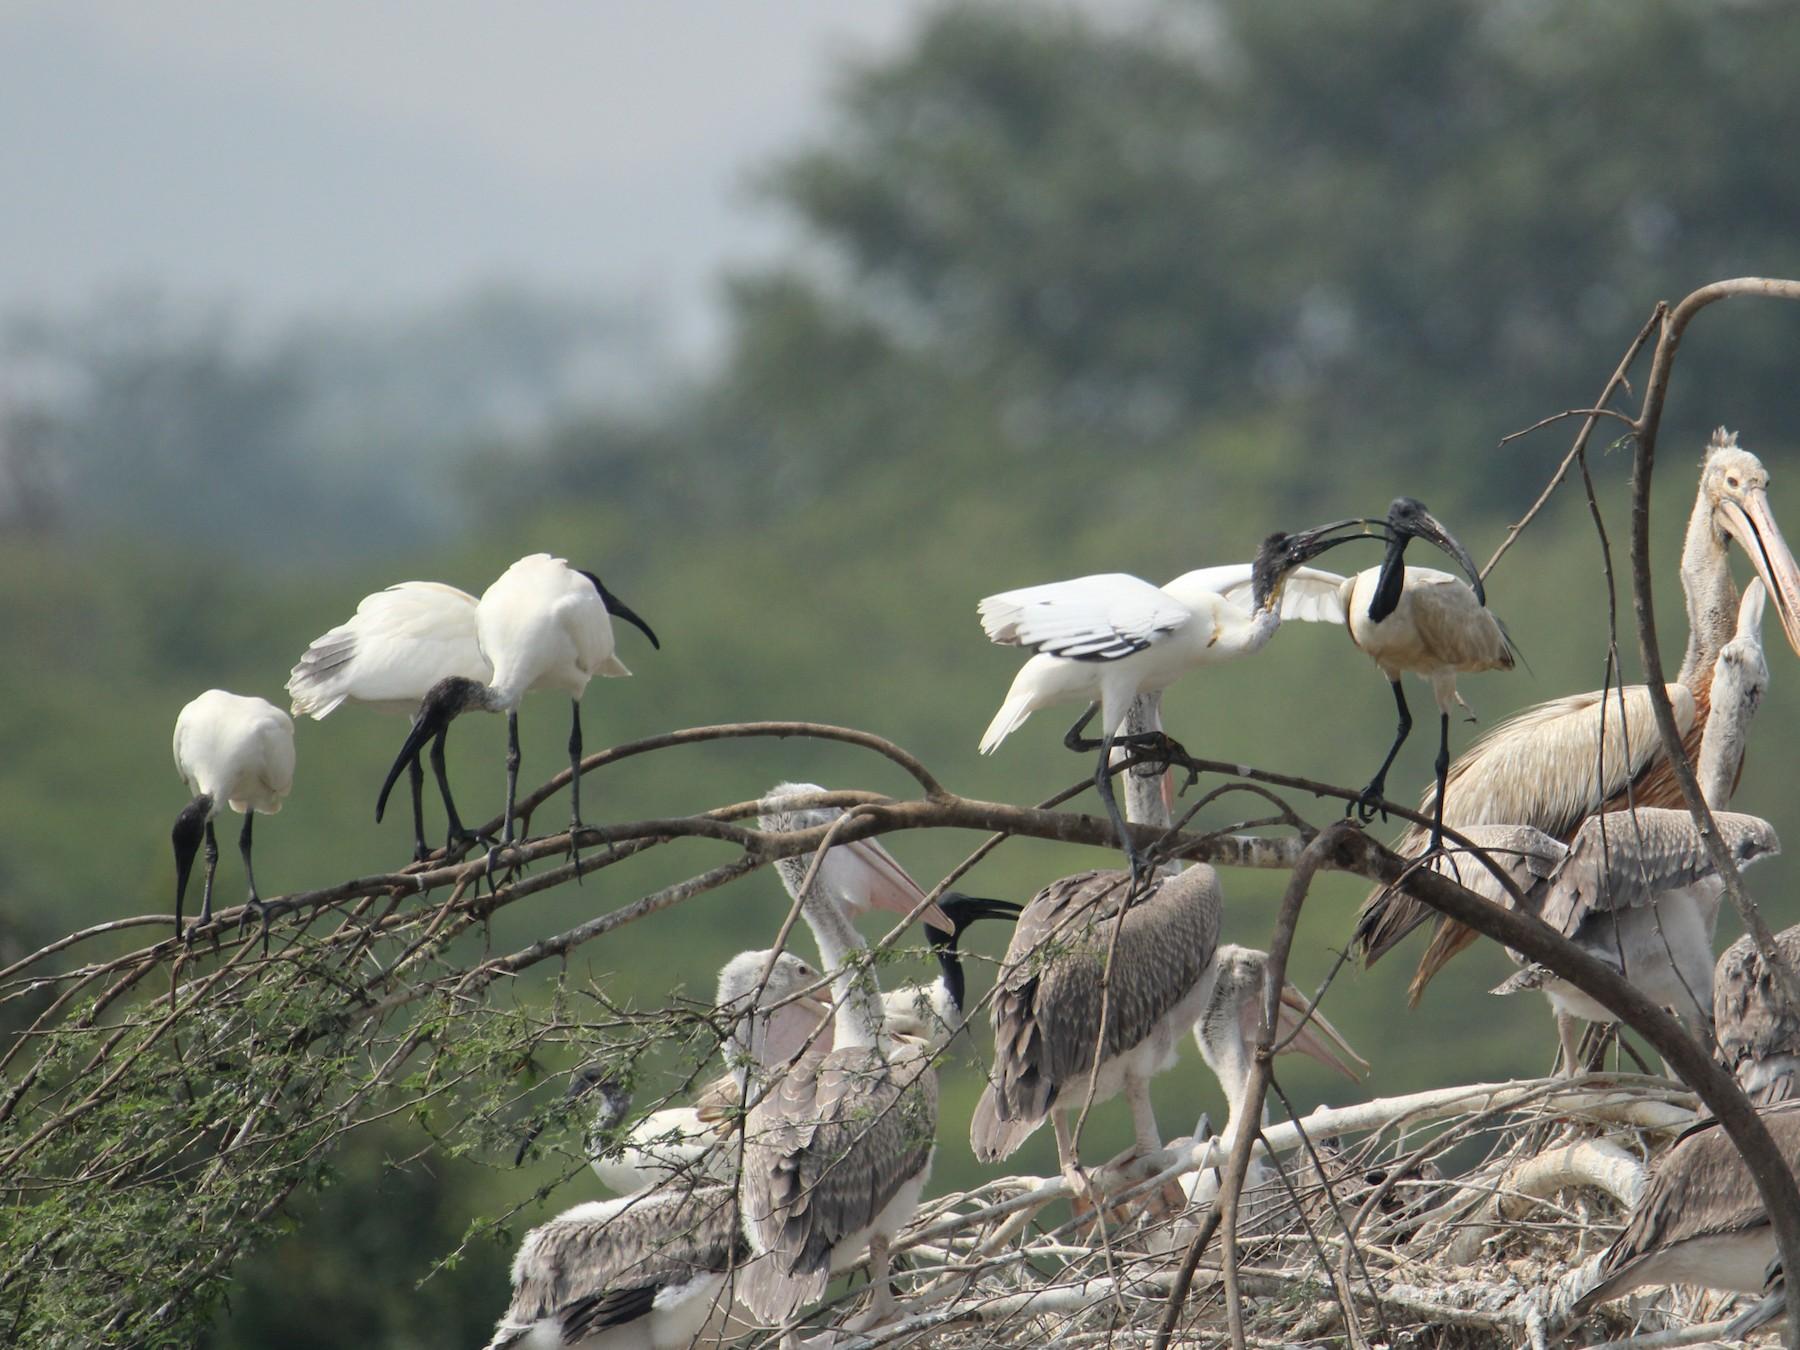 Black-headed Ibis - Karthick VS